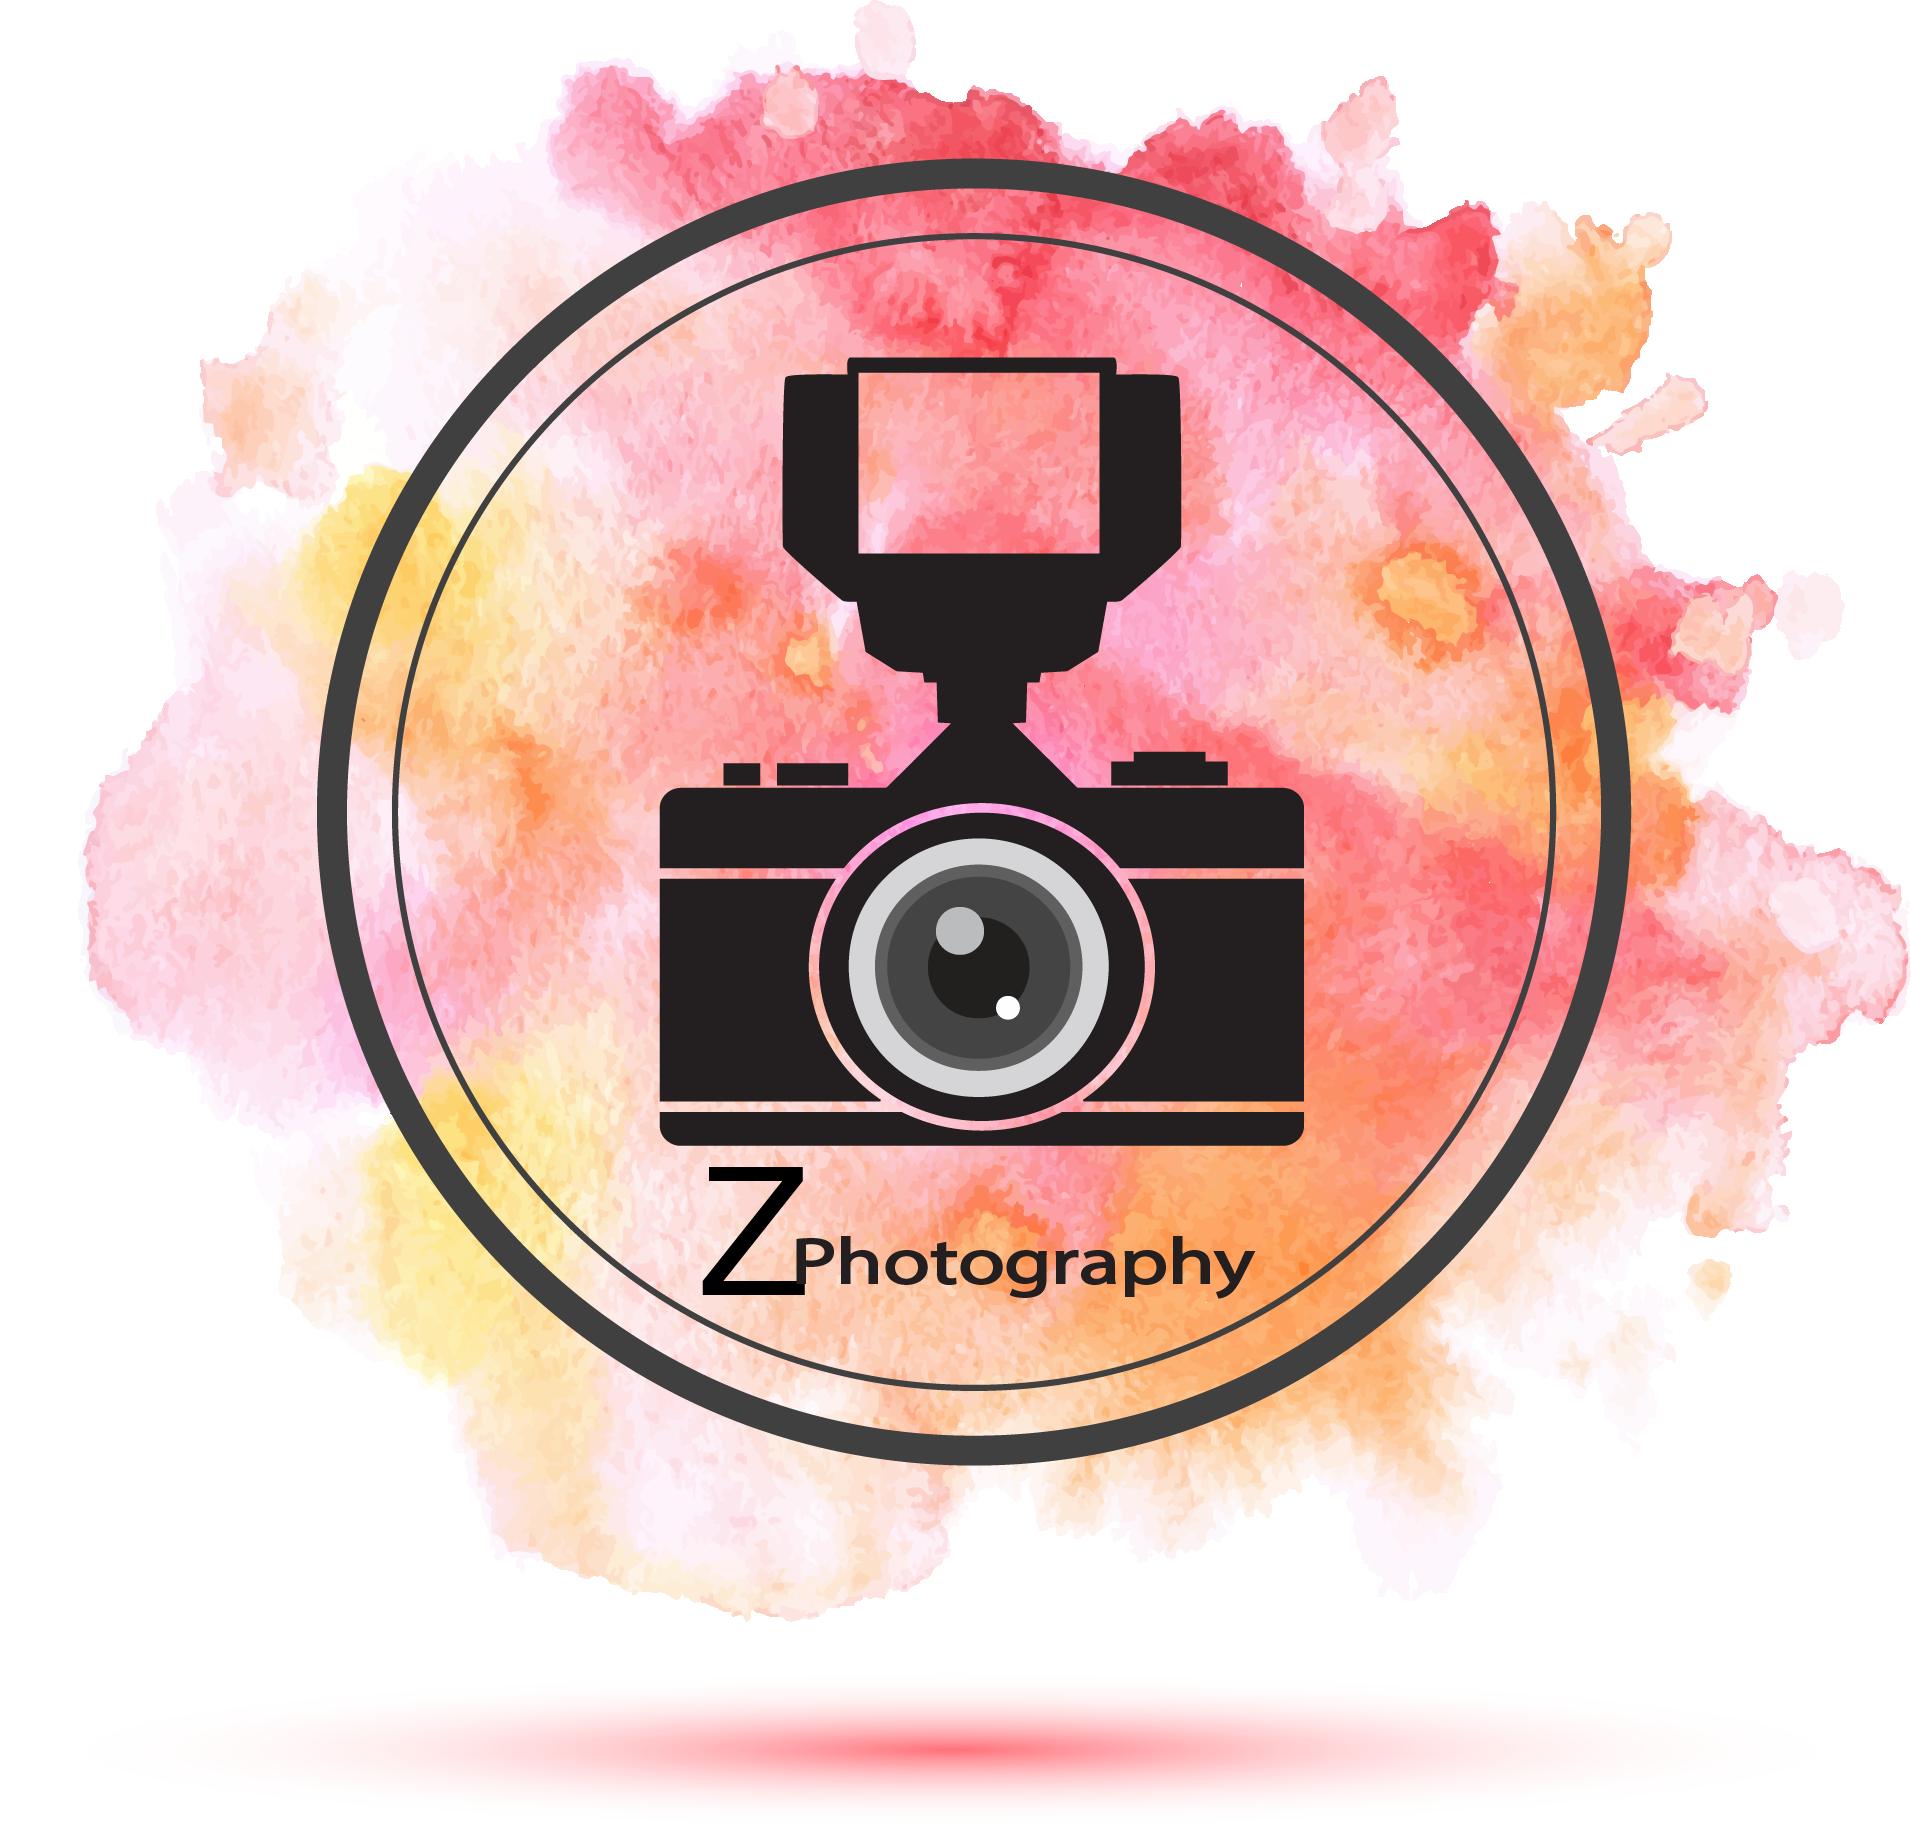 Heartbeat clipart camera. Photographer logo photo studio